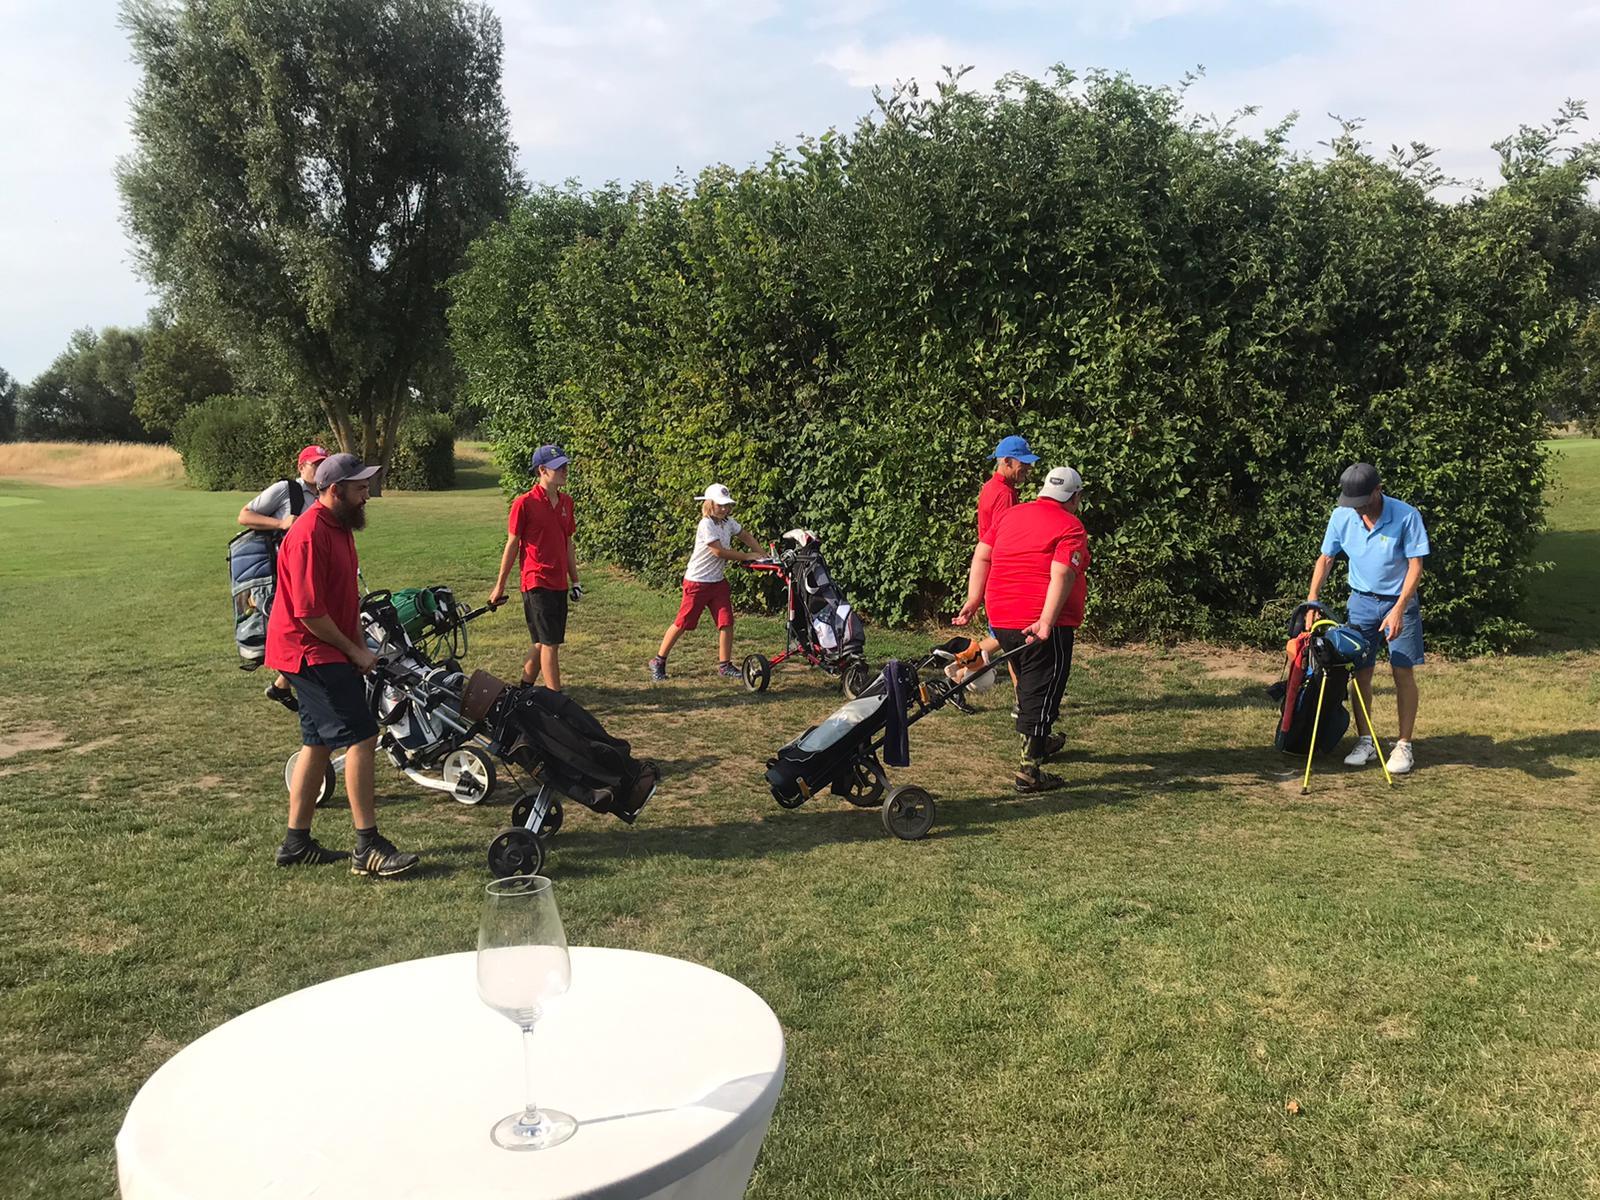 40_Golfturnier_Soroptimist_Golf_en_blanc